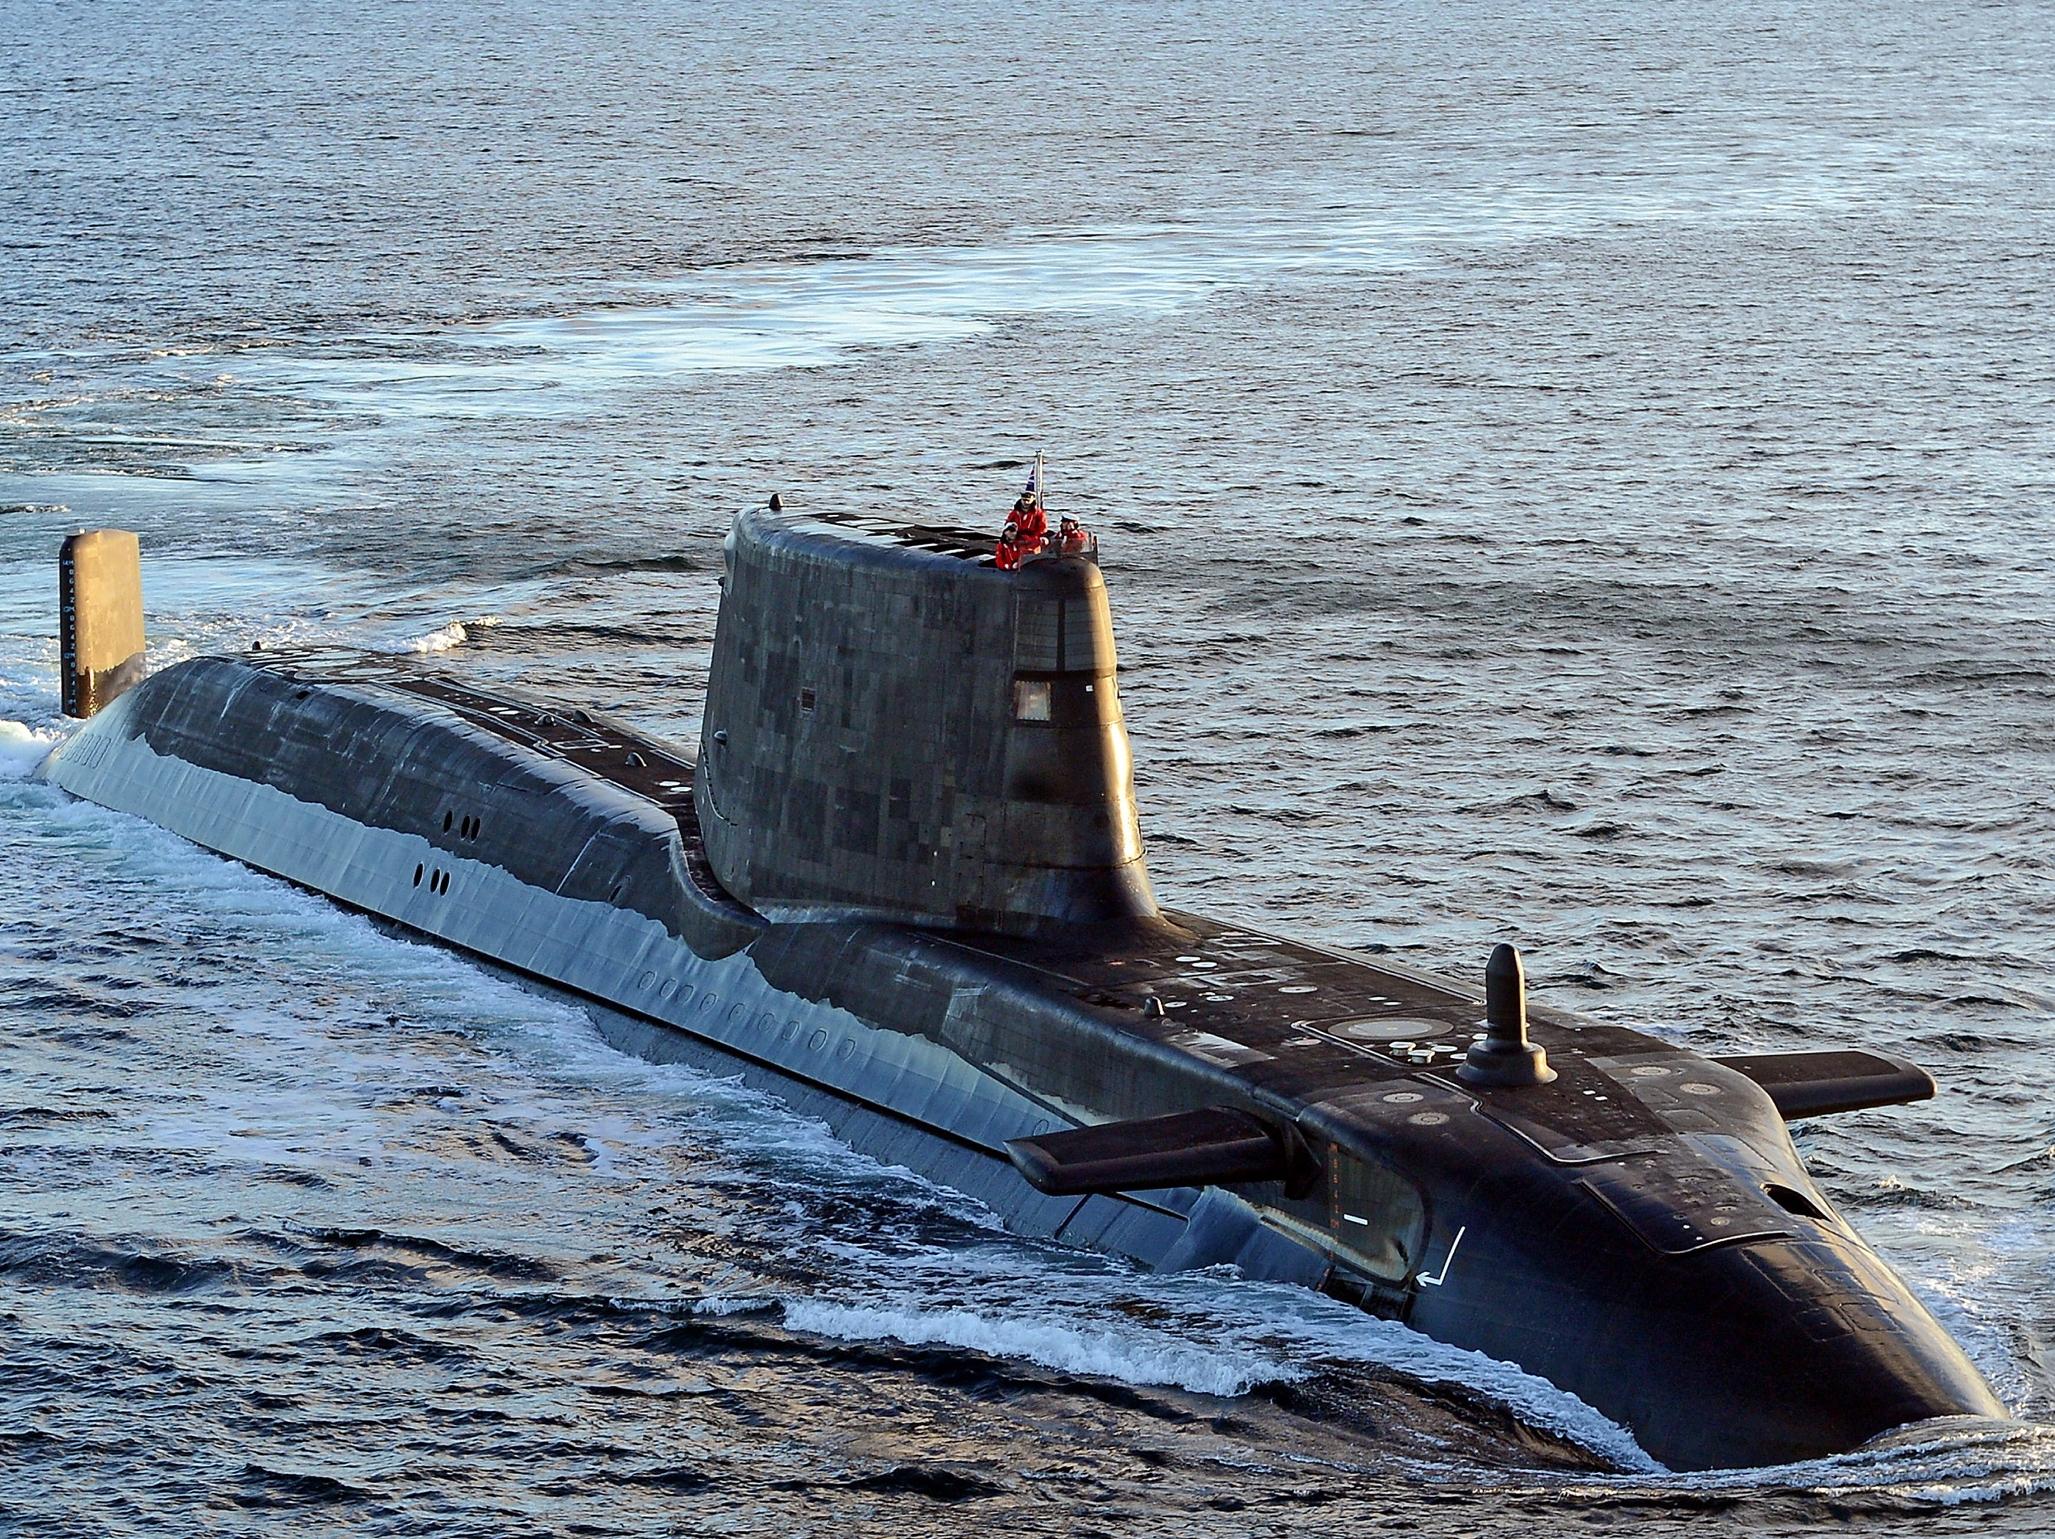 Astute-class HMS Ambush